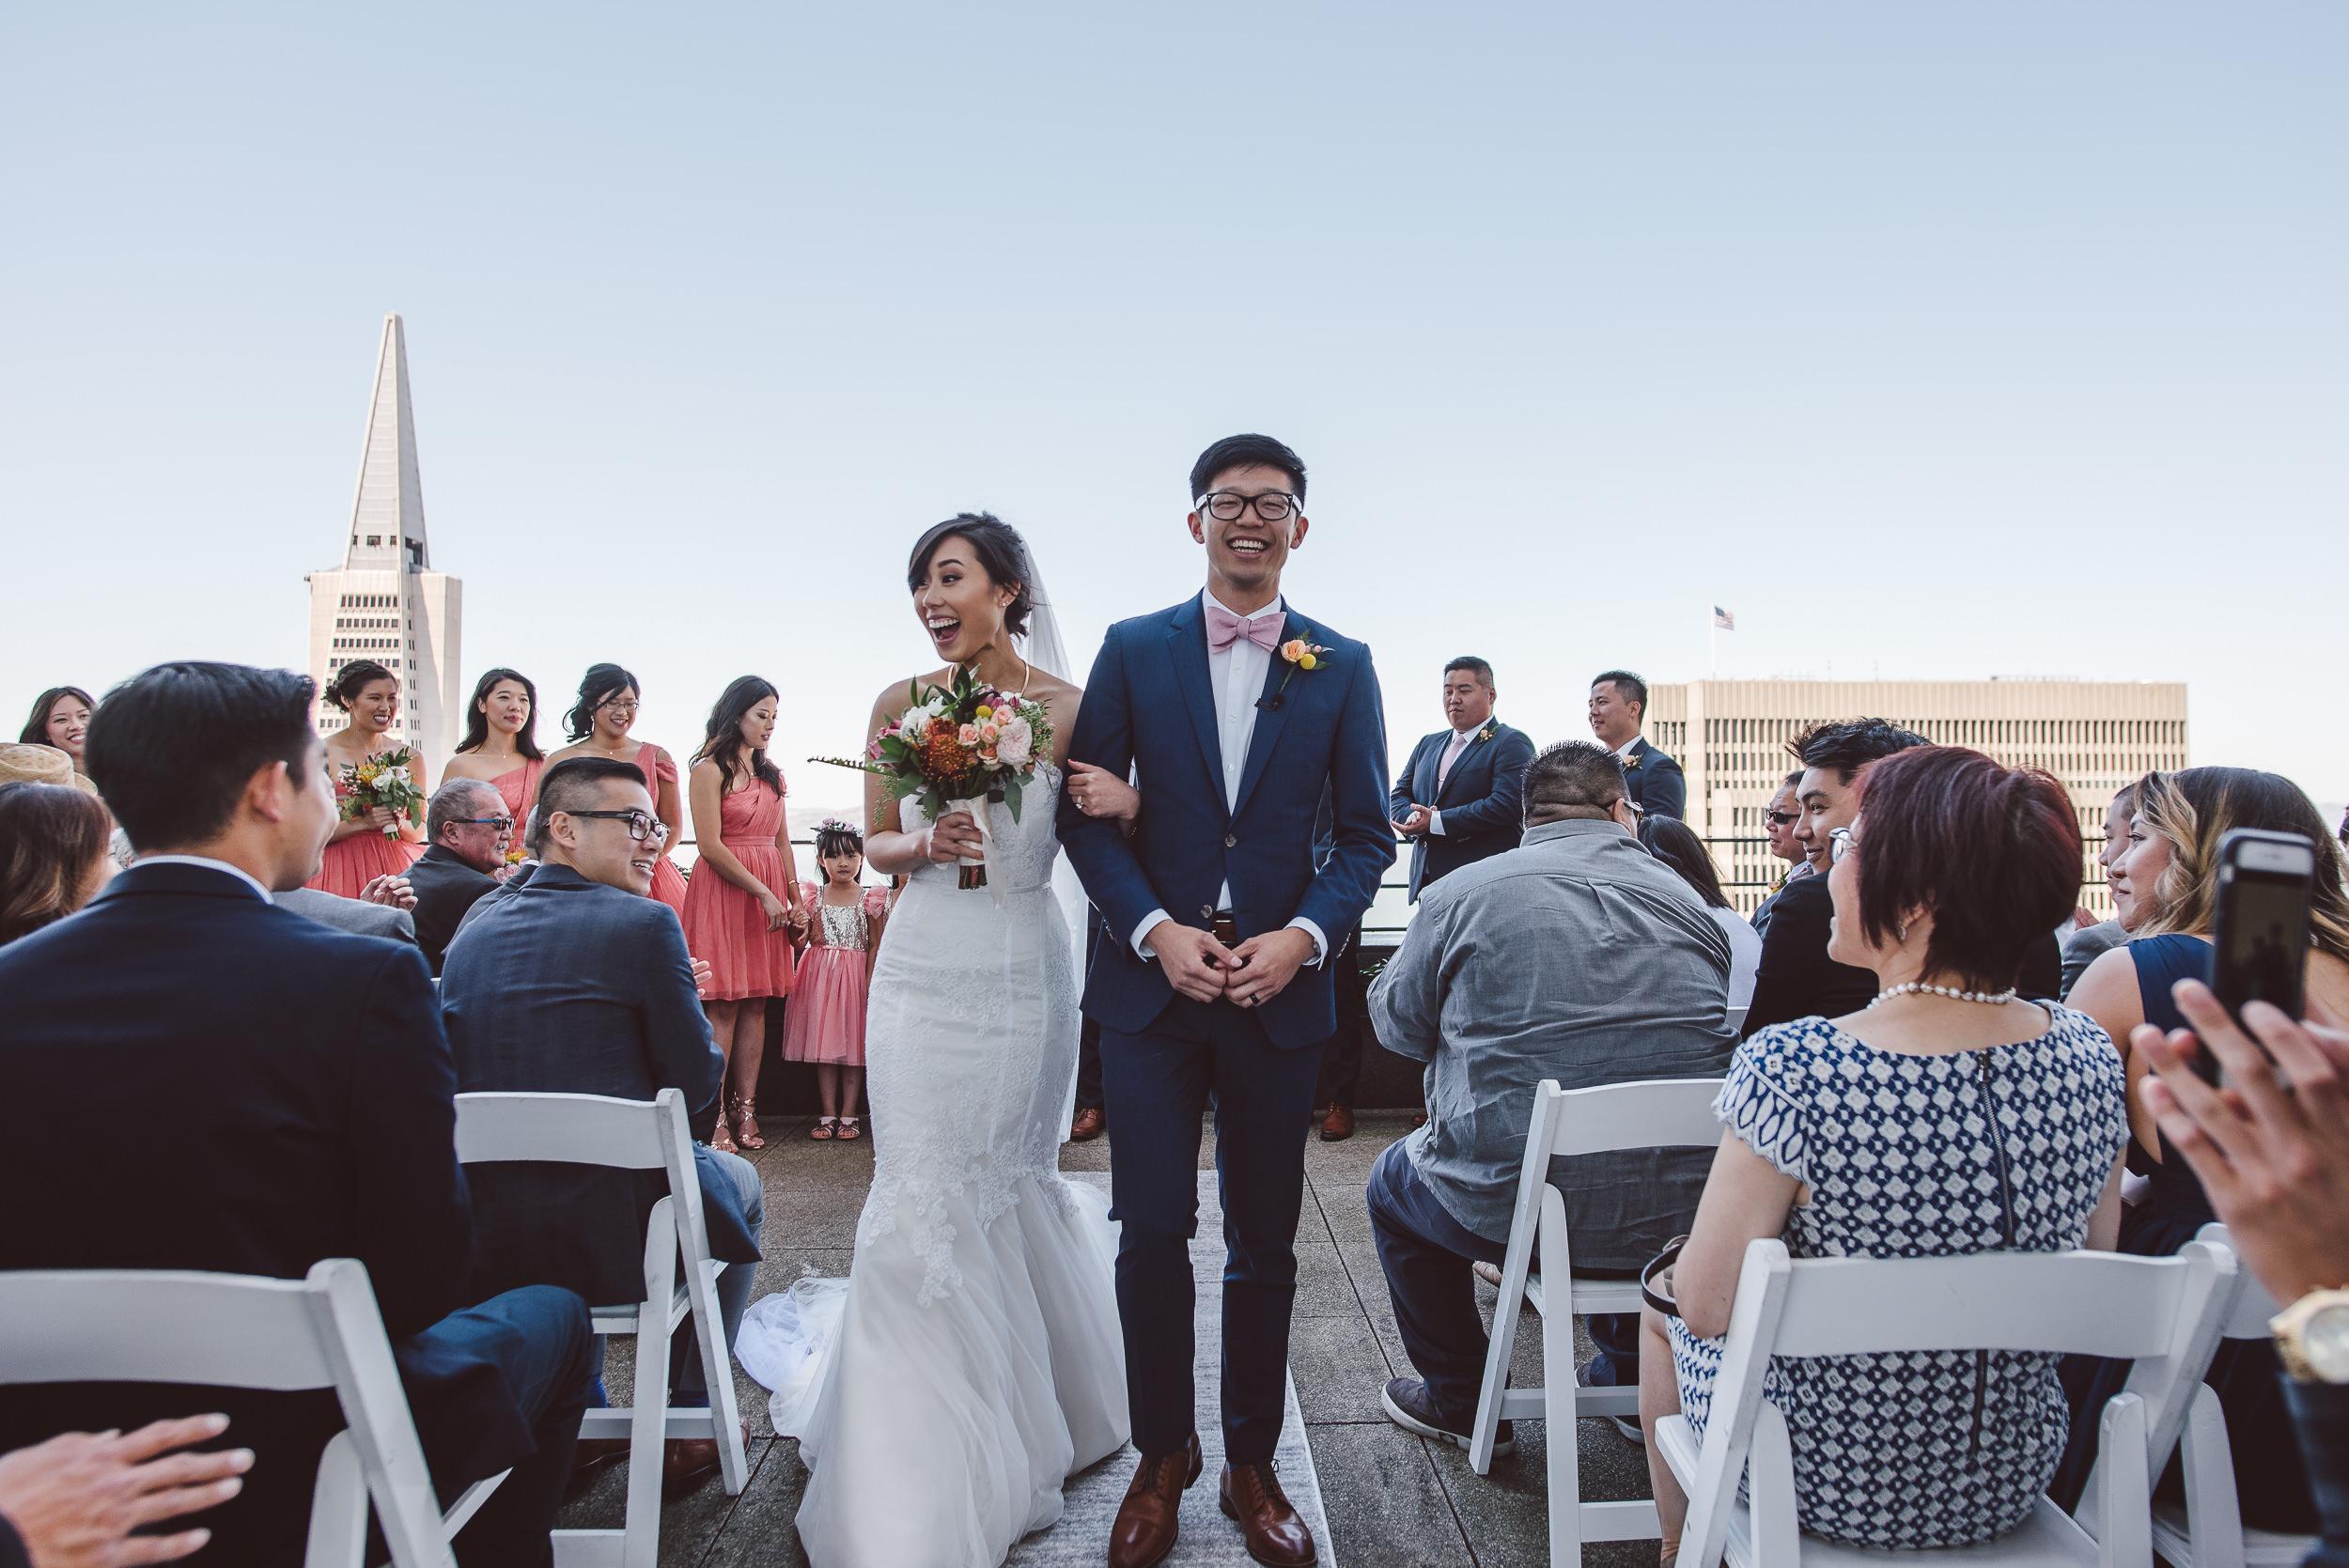 Loews-Regency-San-Francisco-Wedding-Photography-037.jpg